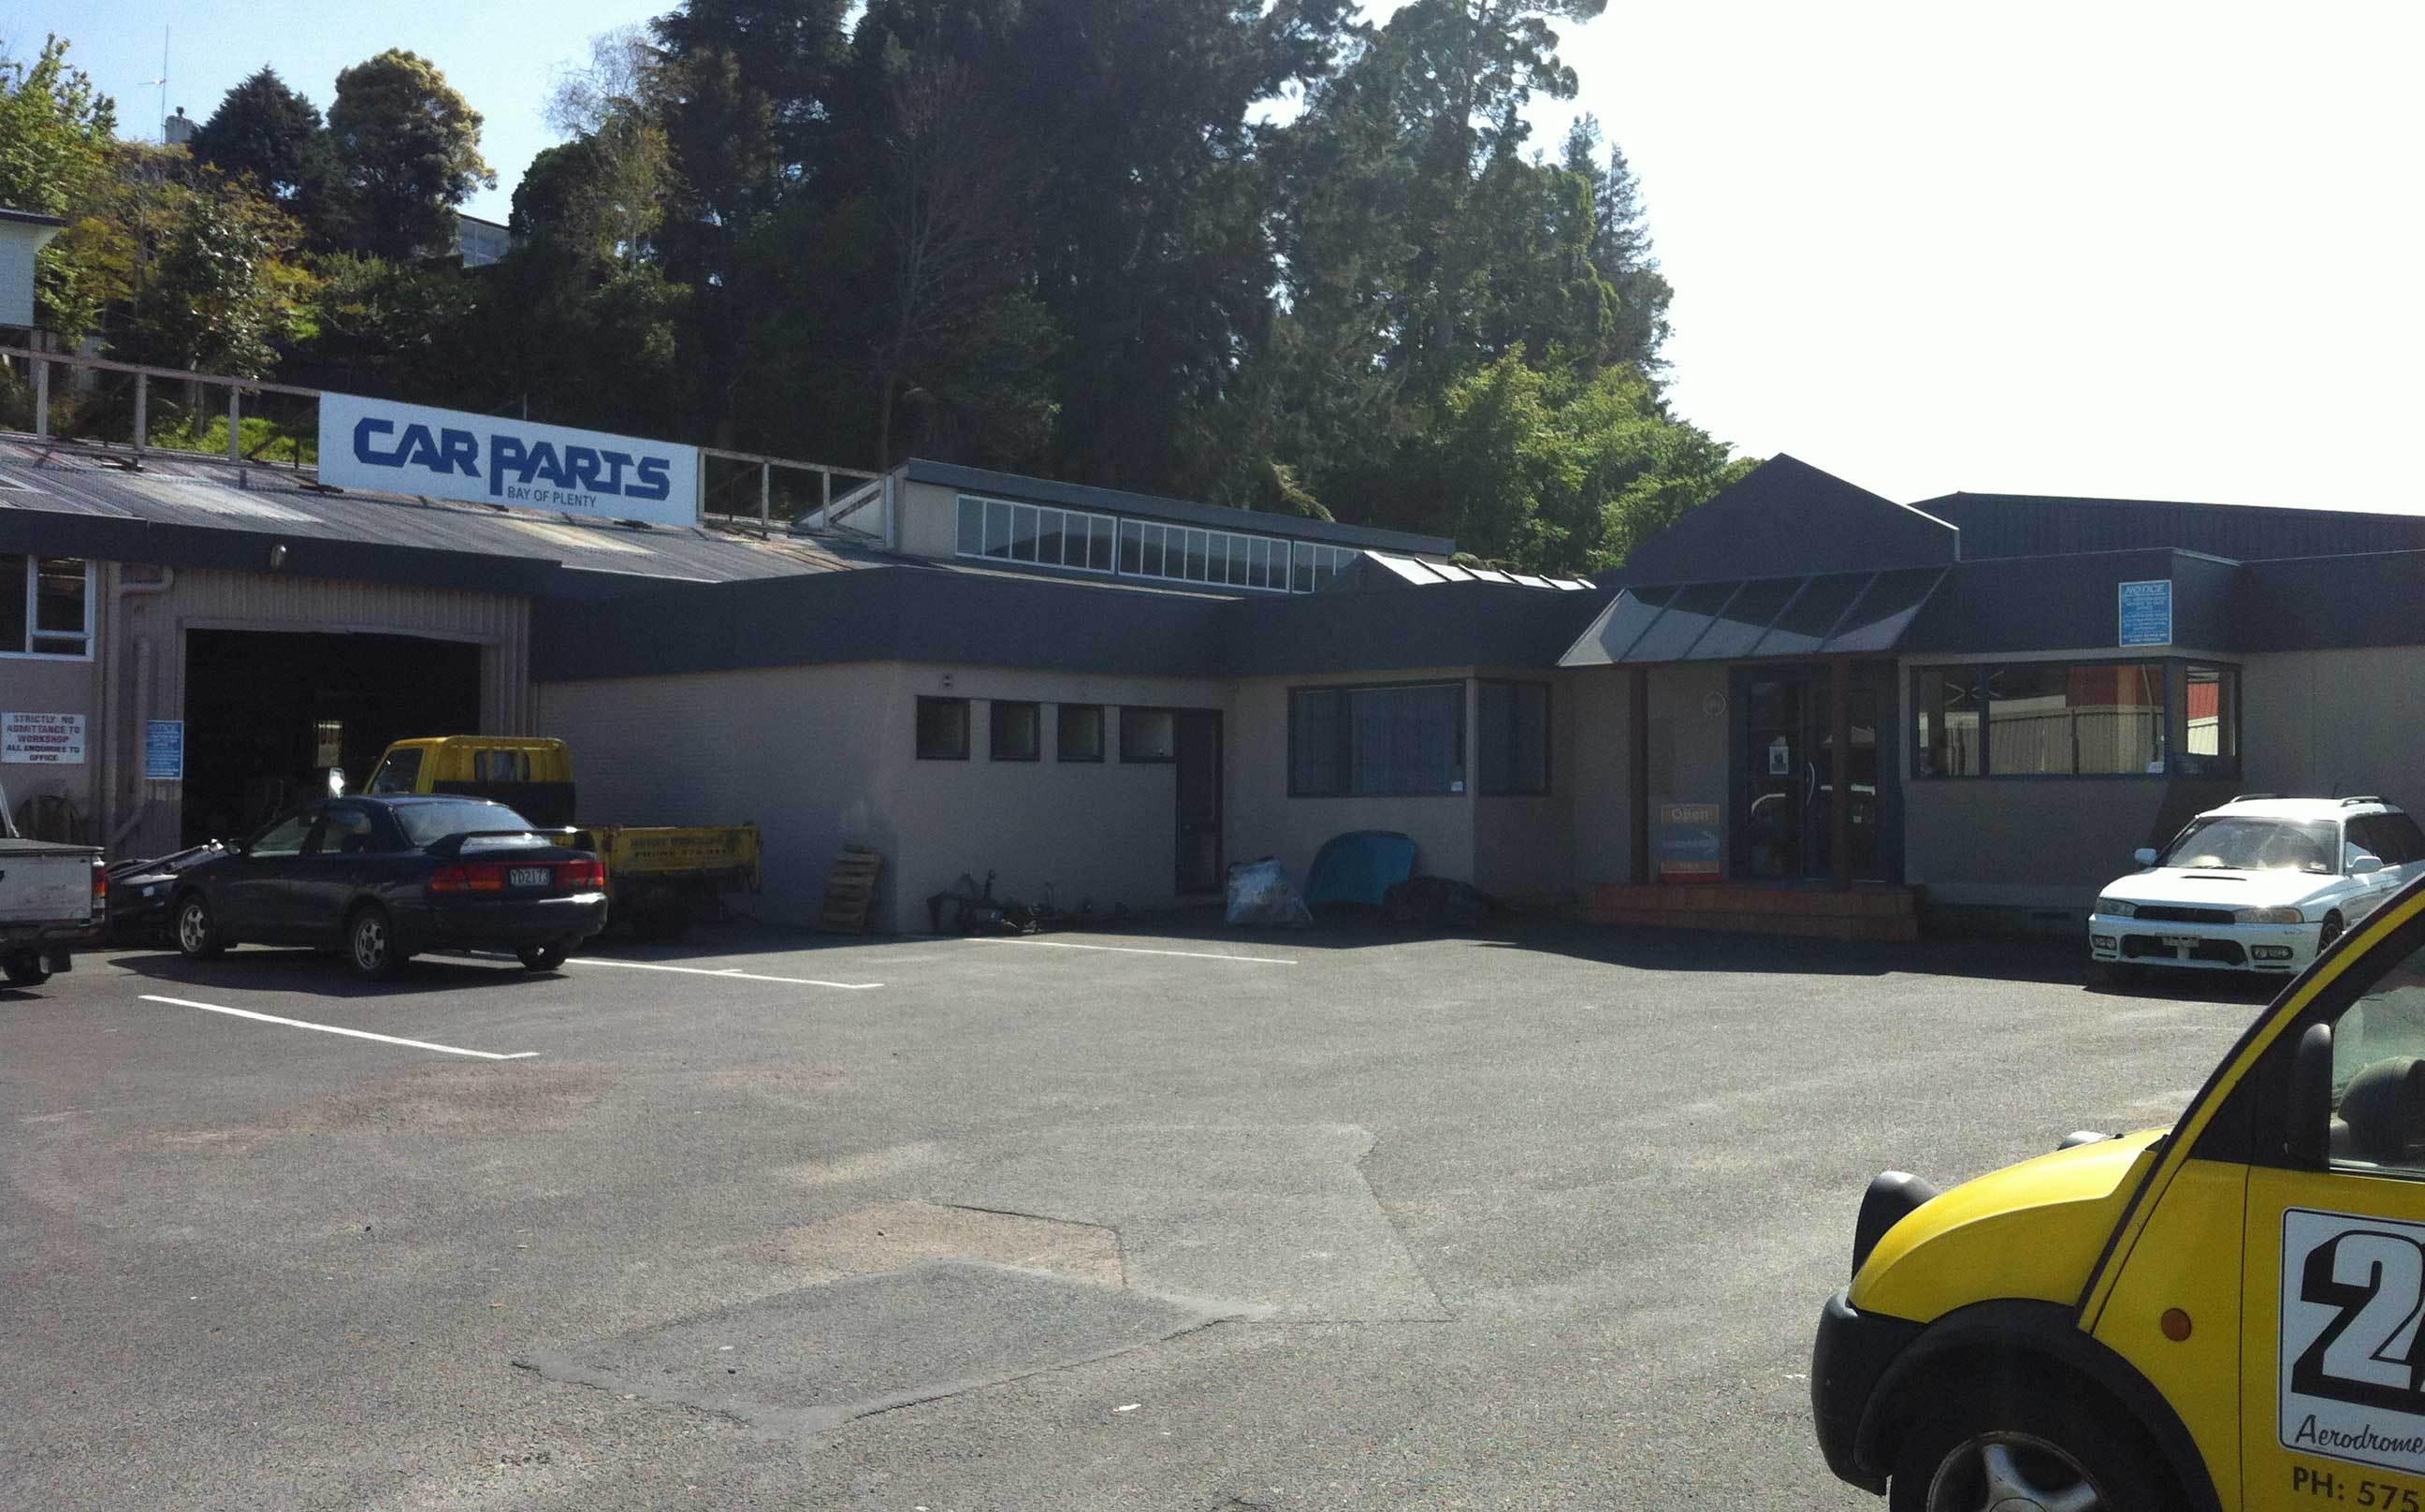 A range of car parts at Mount Wrecking Company in Tauranga